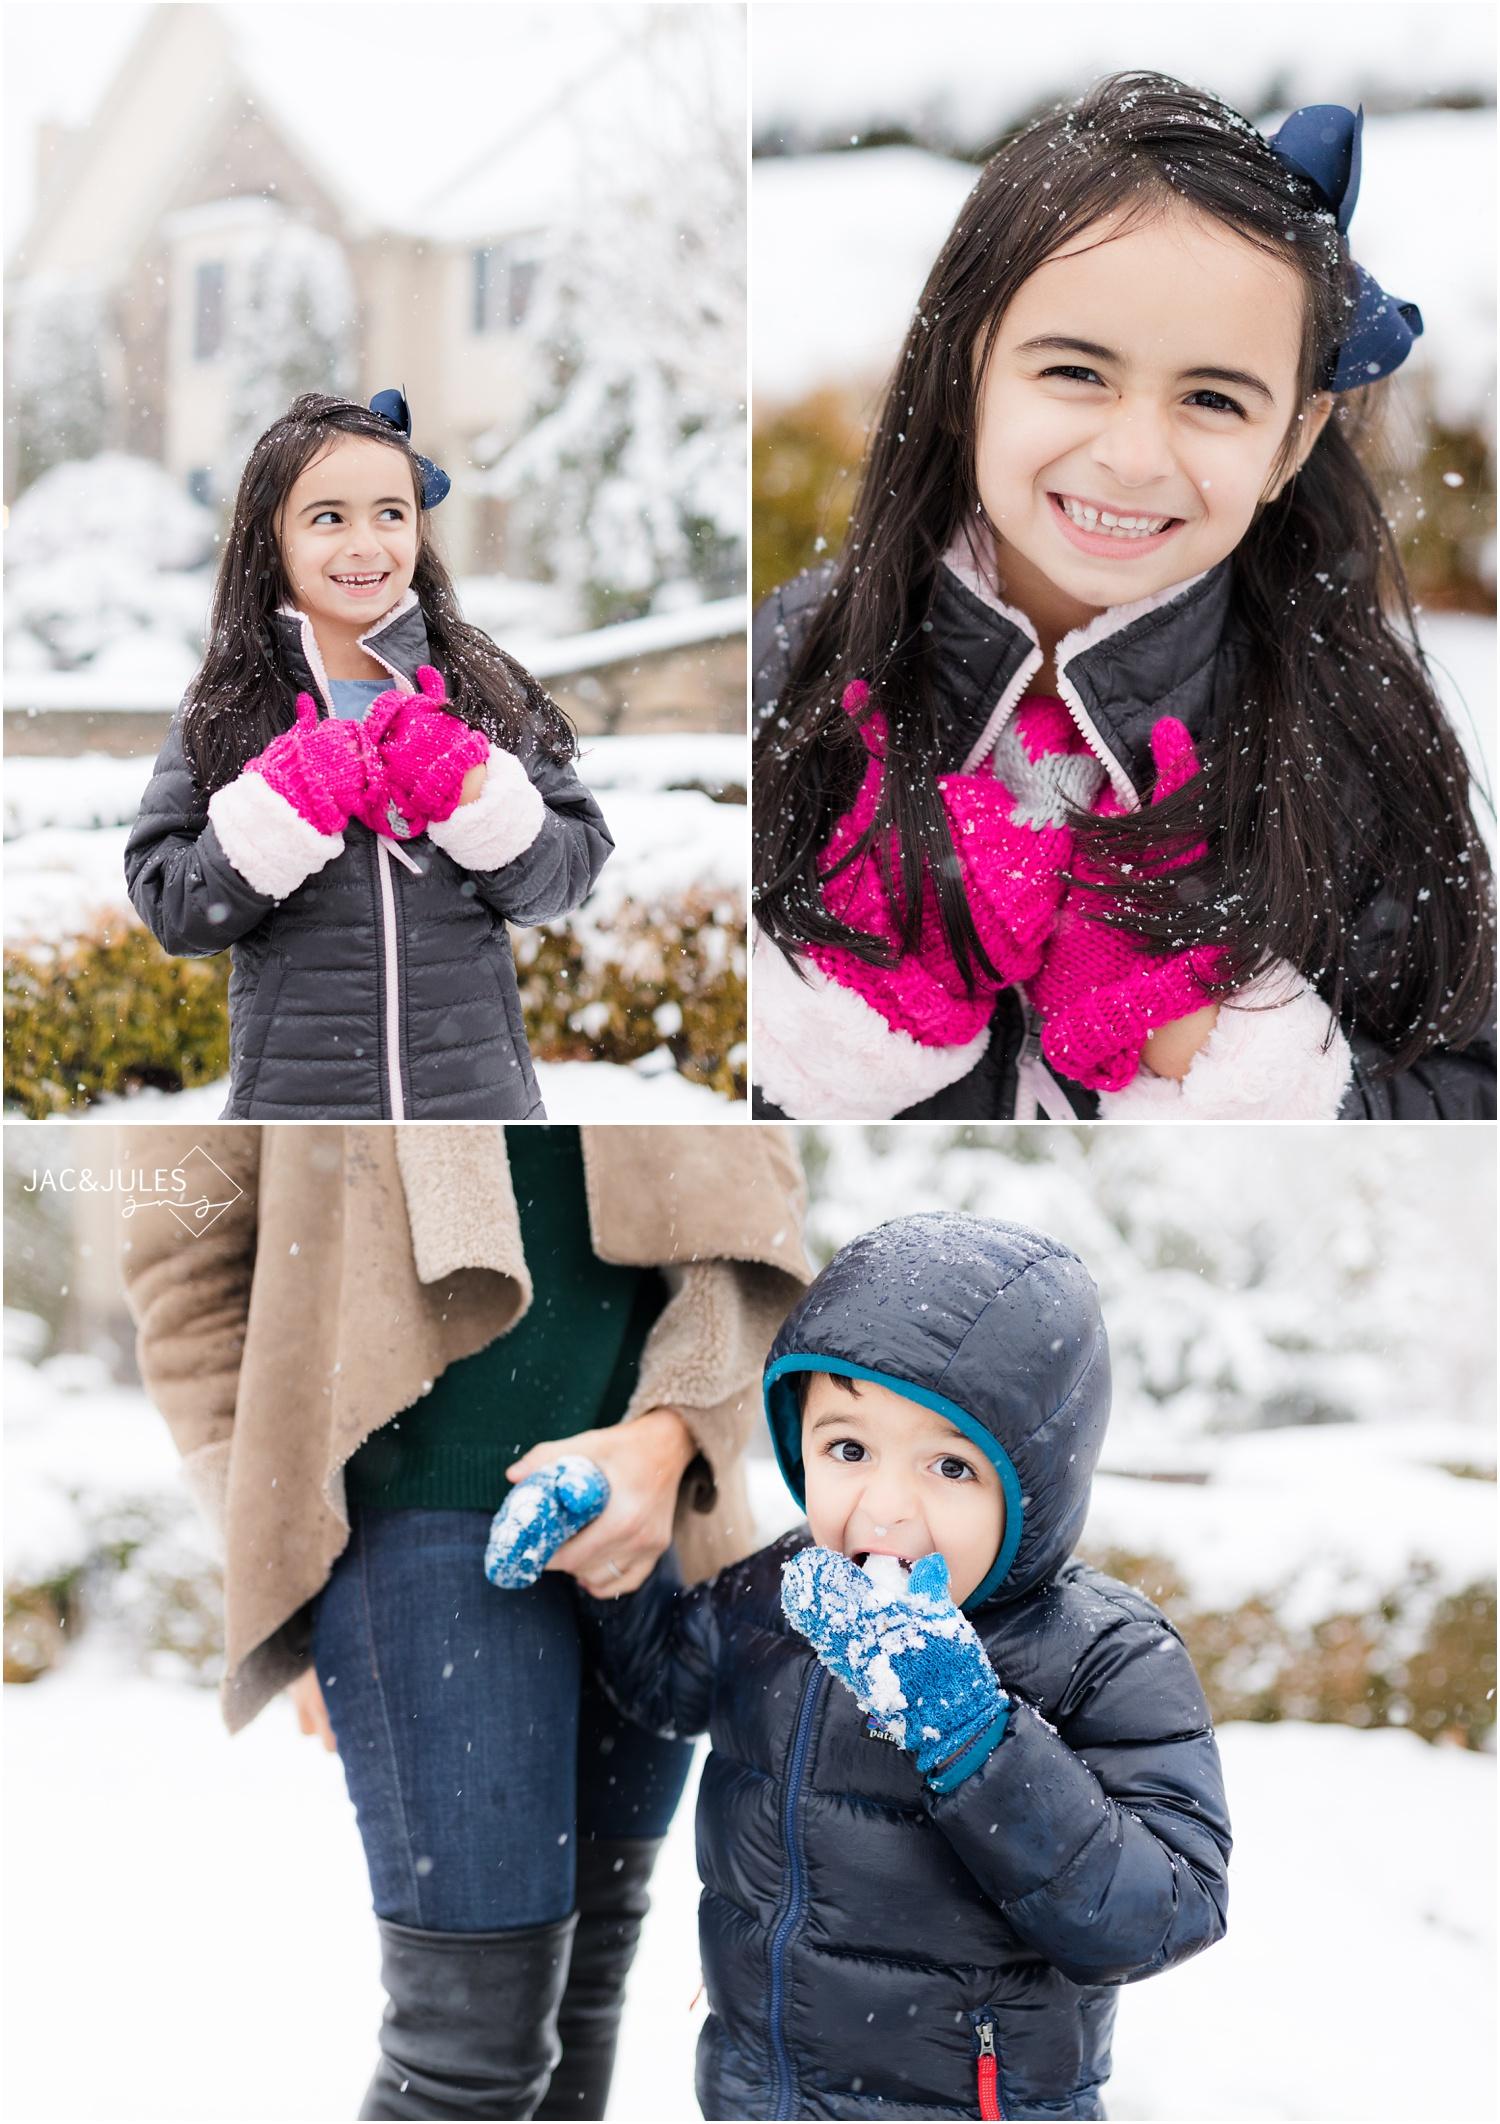 Snowy Family Photos In Marlboro Nj Nj Natural Light Photographers Jac Jules